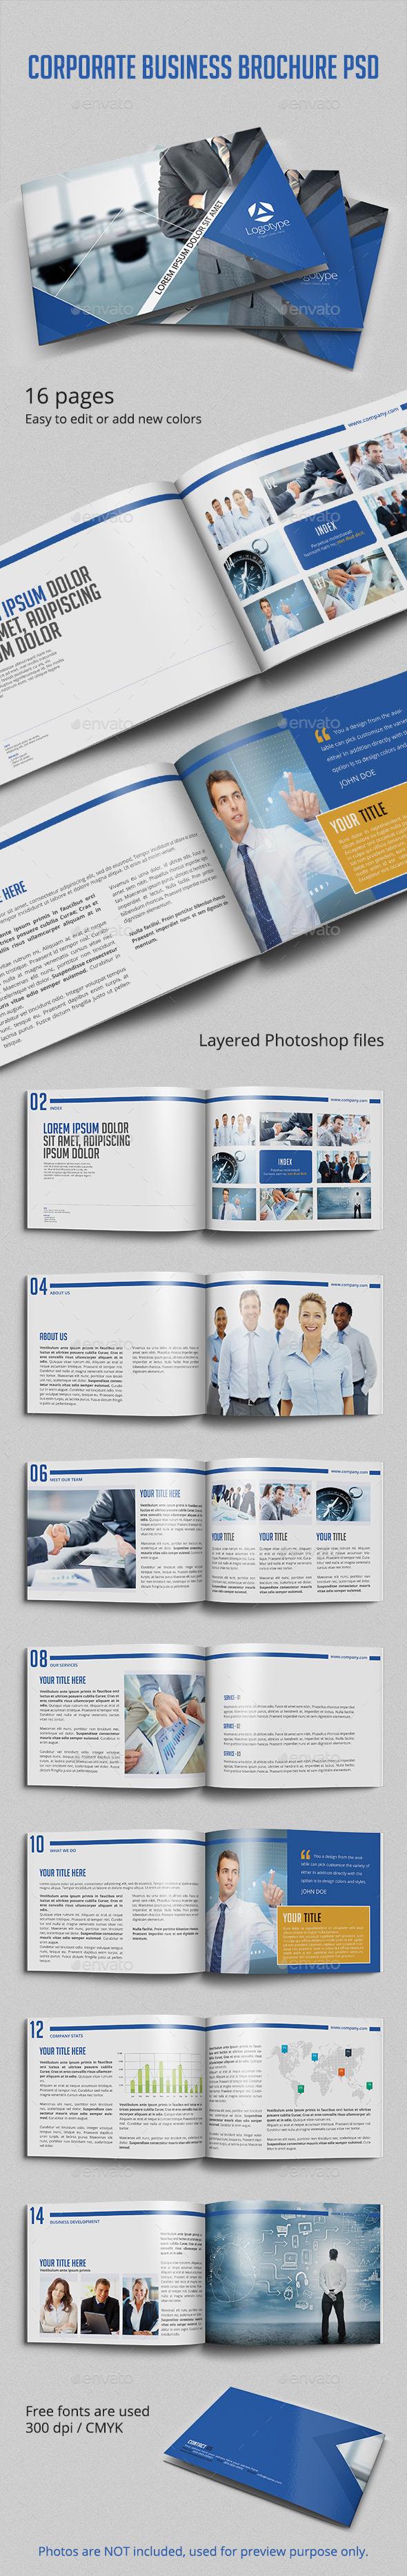 GraphicRiver Corporate Business Brochure PSD Template 11448161